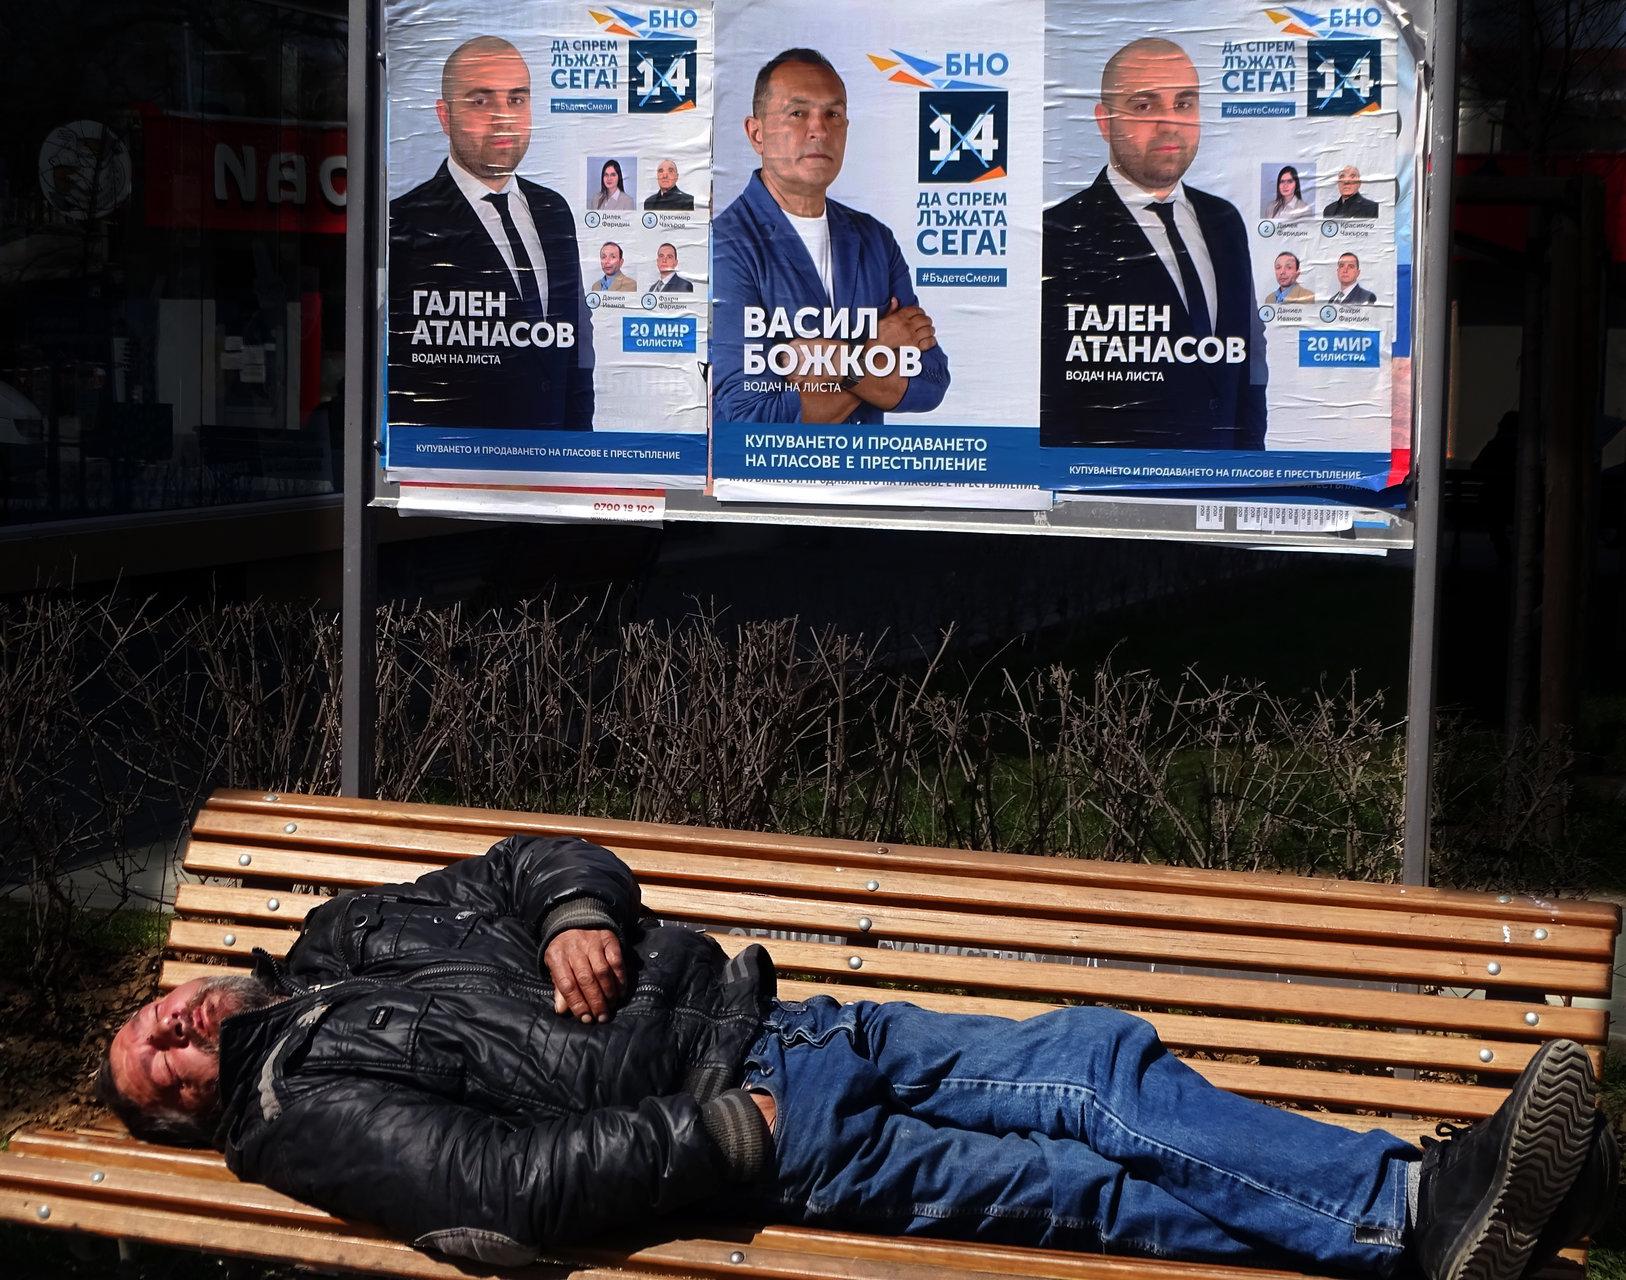 Photo in Street | Author Ivan Hristov - Ihif | PHOTO FORUM